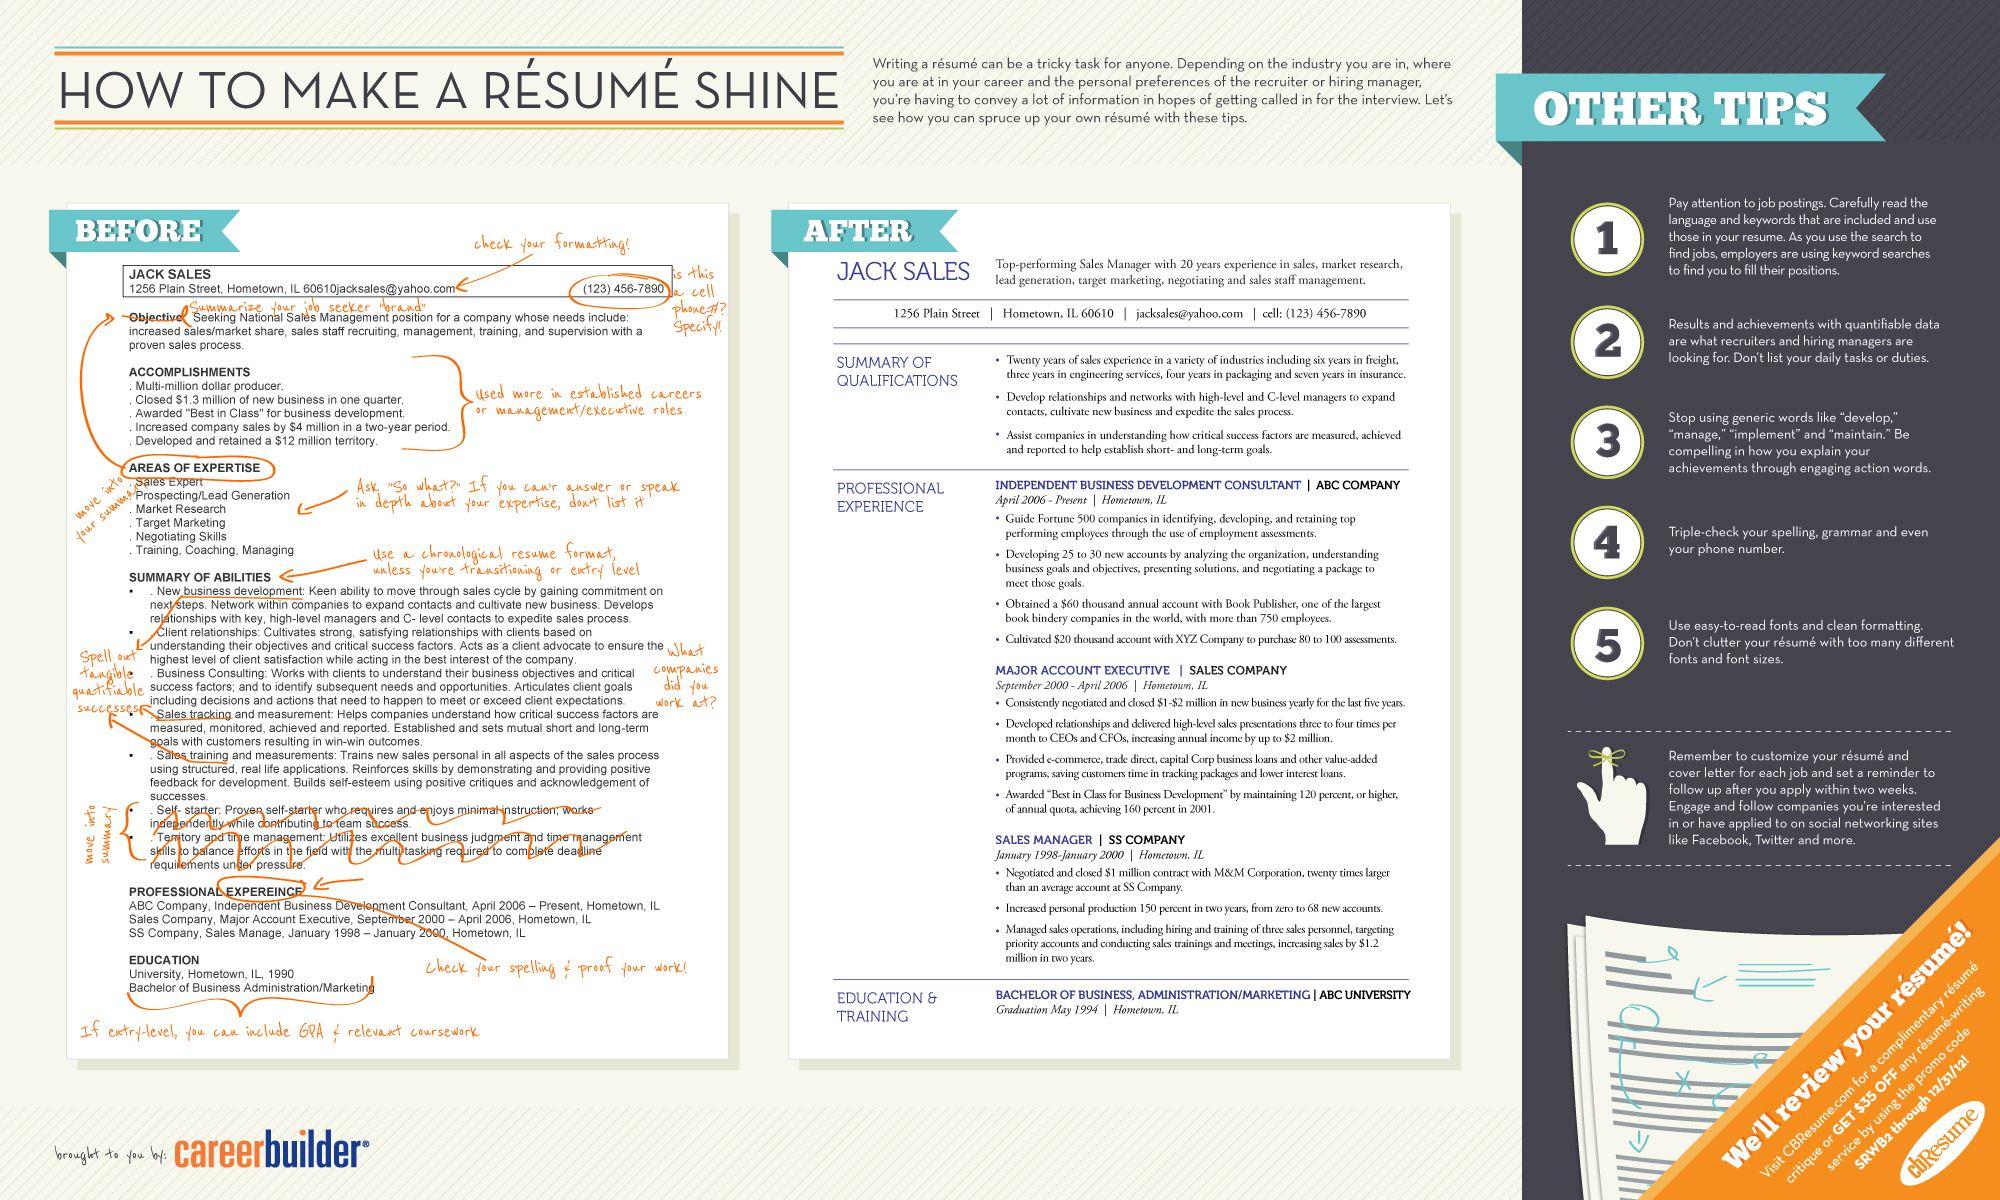 Cómo crear un Curriculum Vitae brillante #infografia #infographic ...